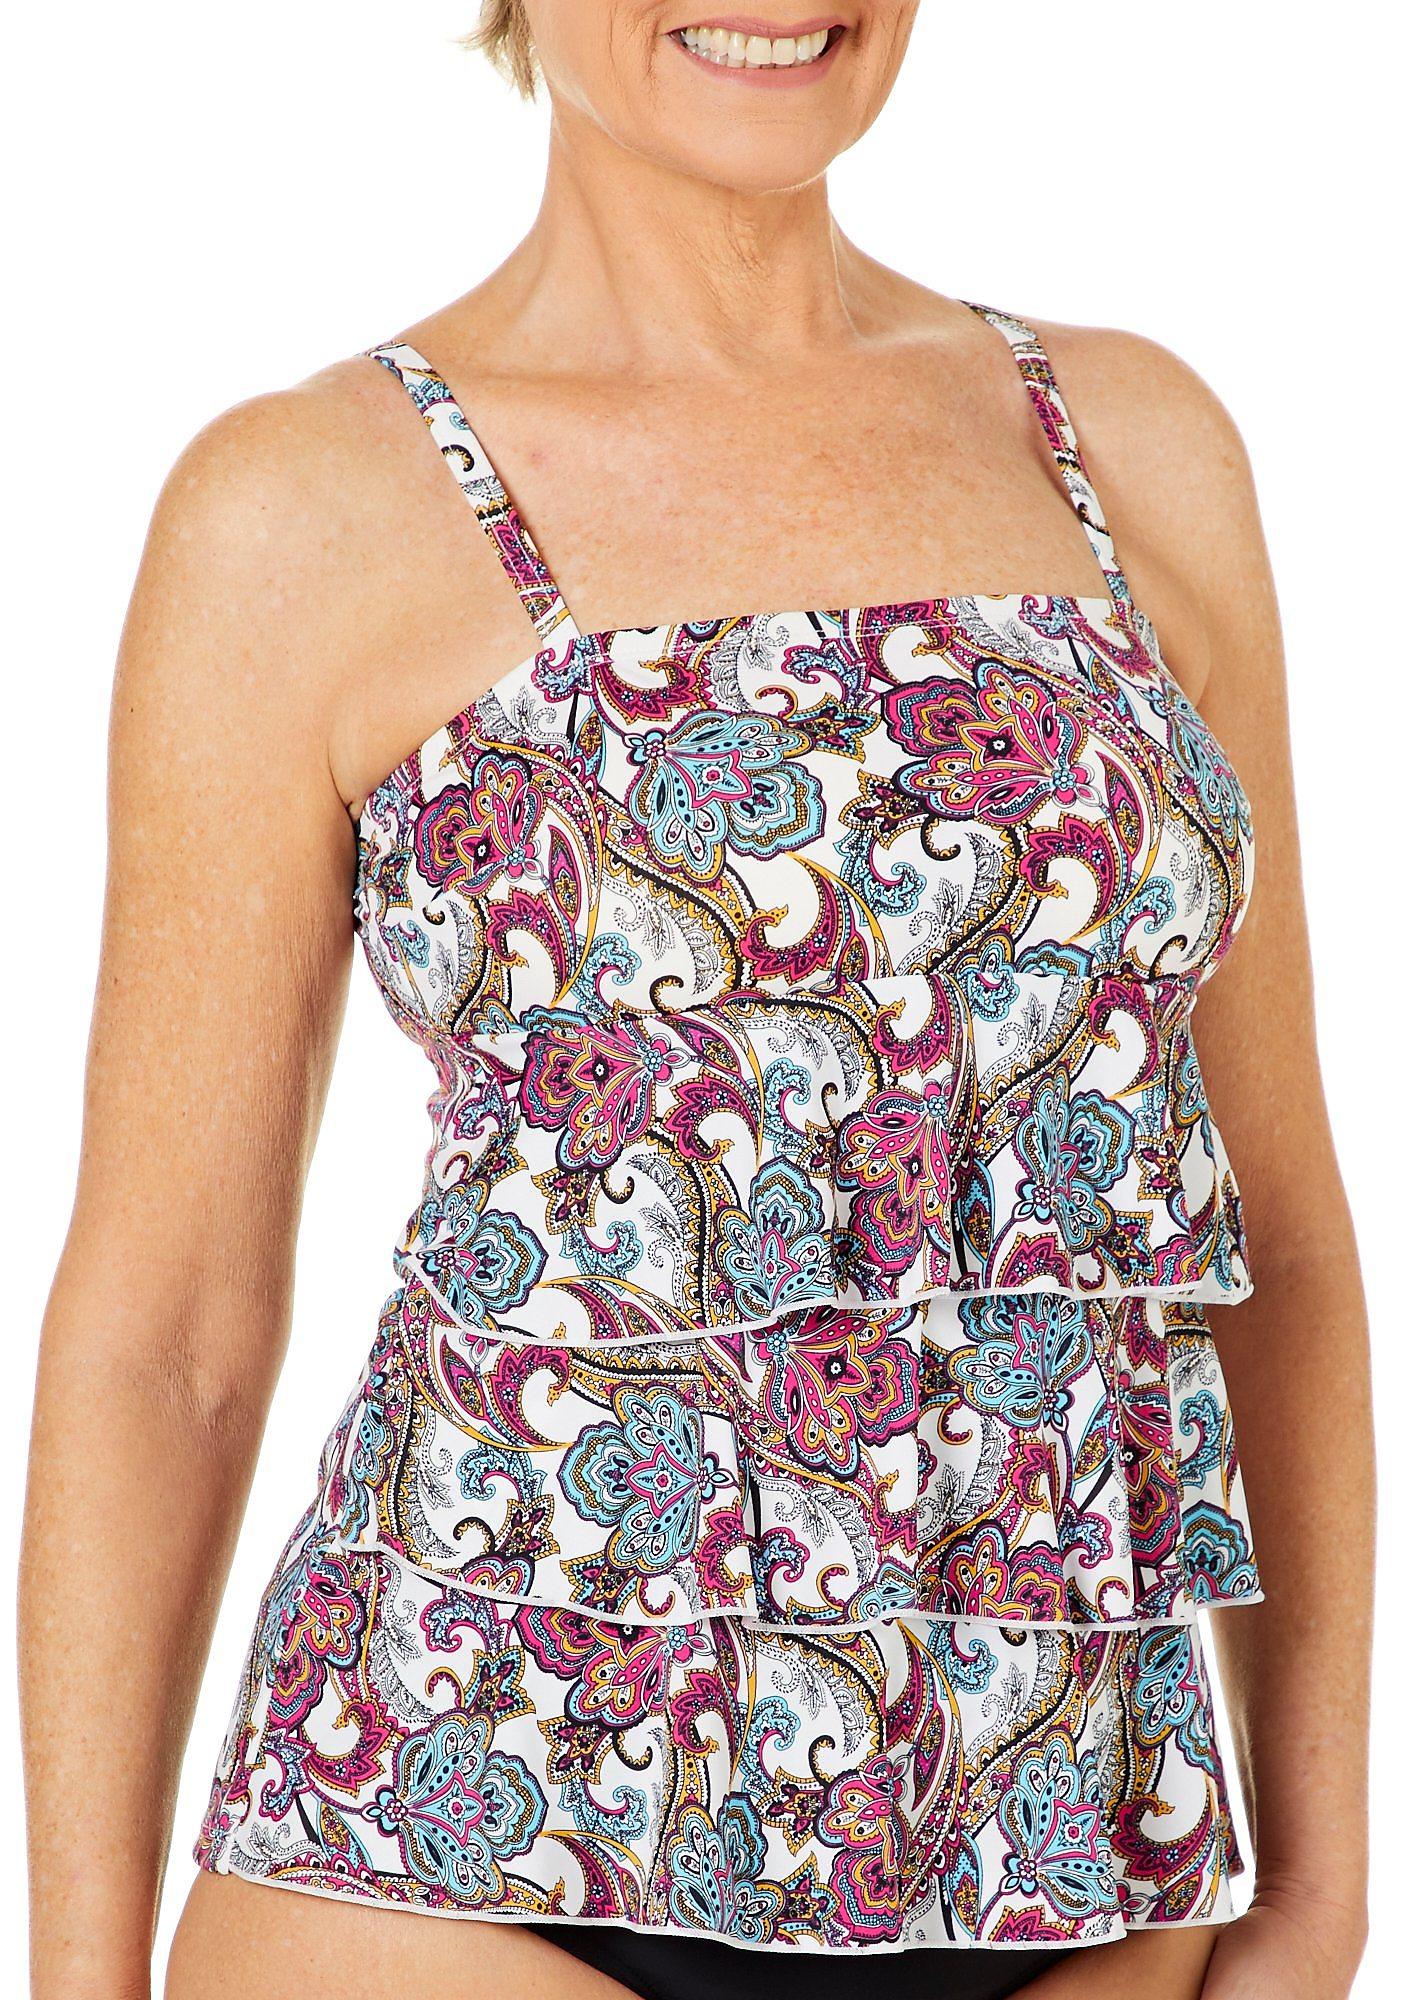 70b52de2c6 A Shore Fit Womens Paisley Print Tier Tankini Top   eBay